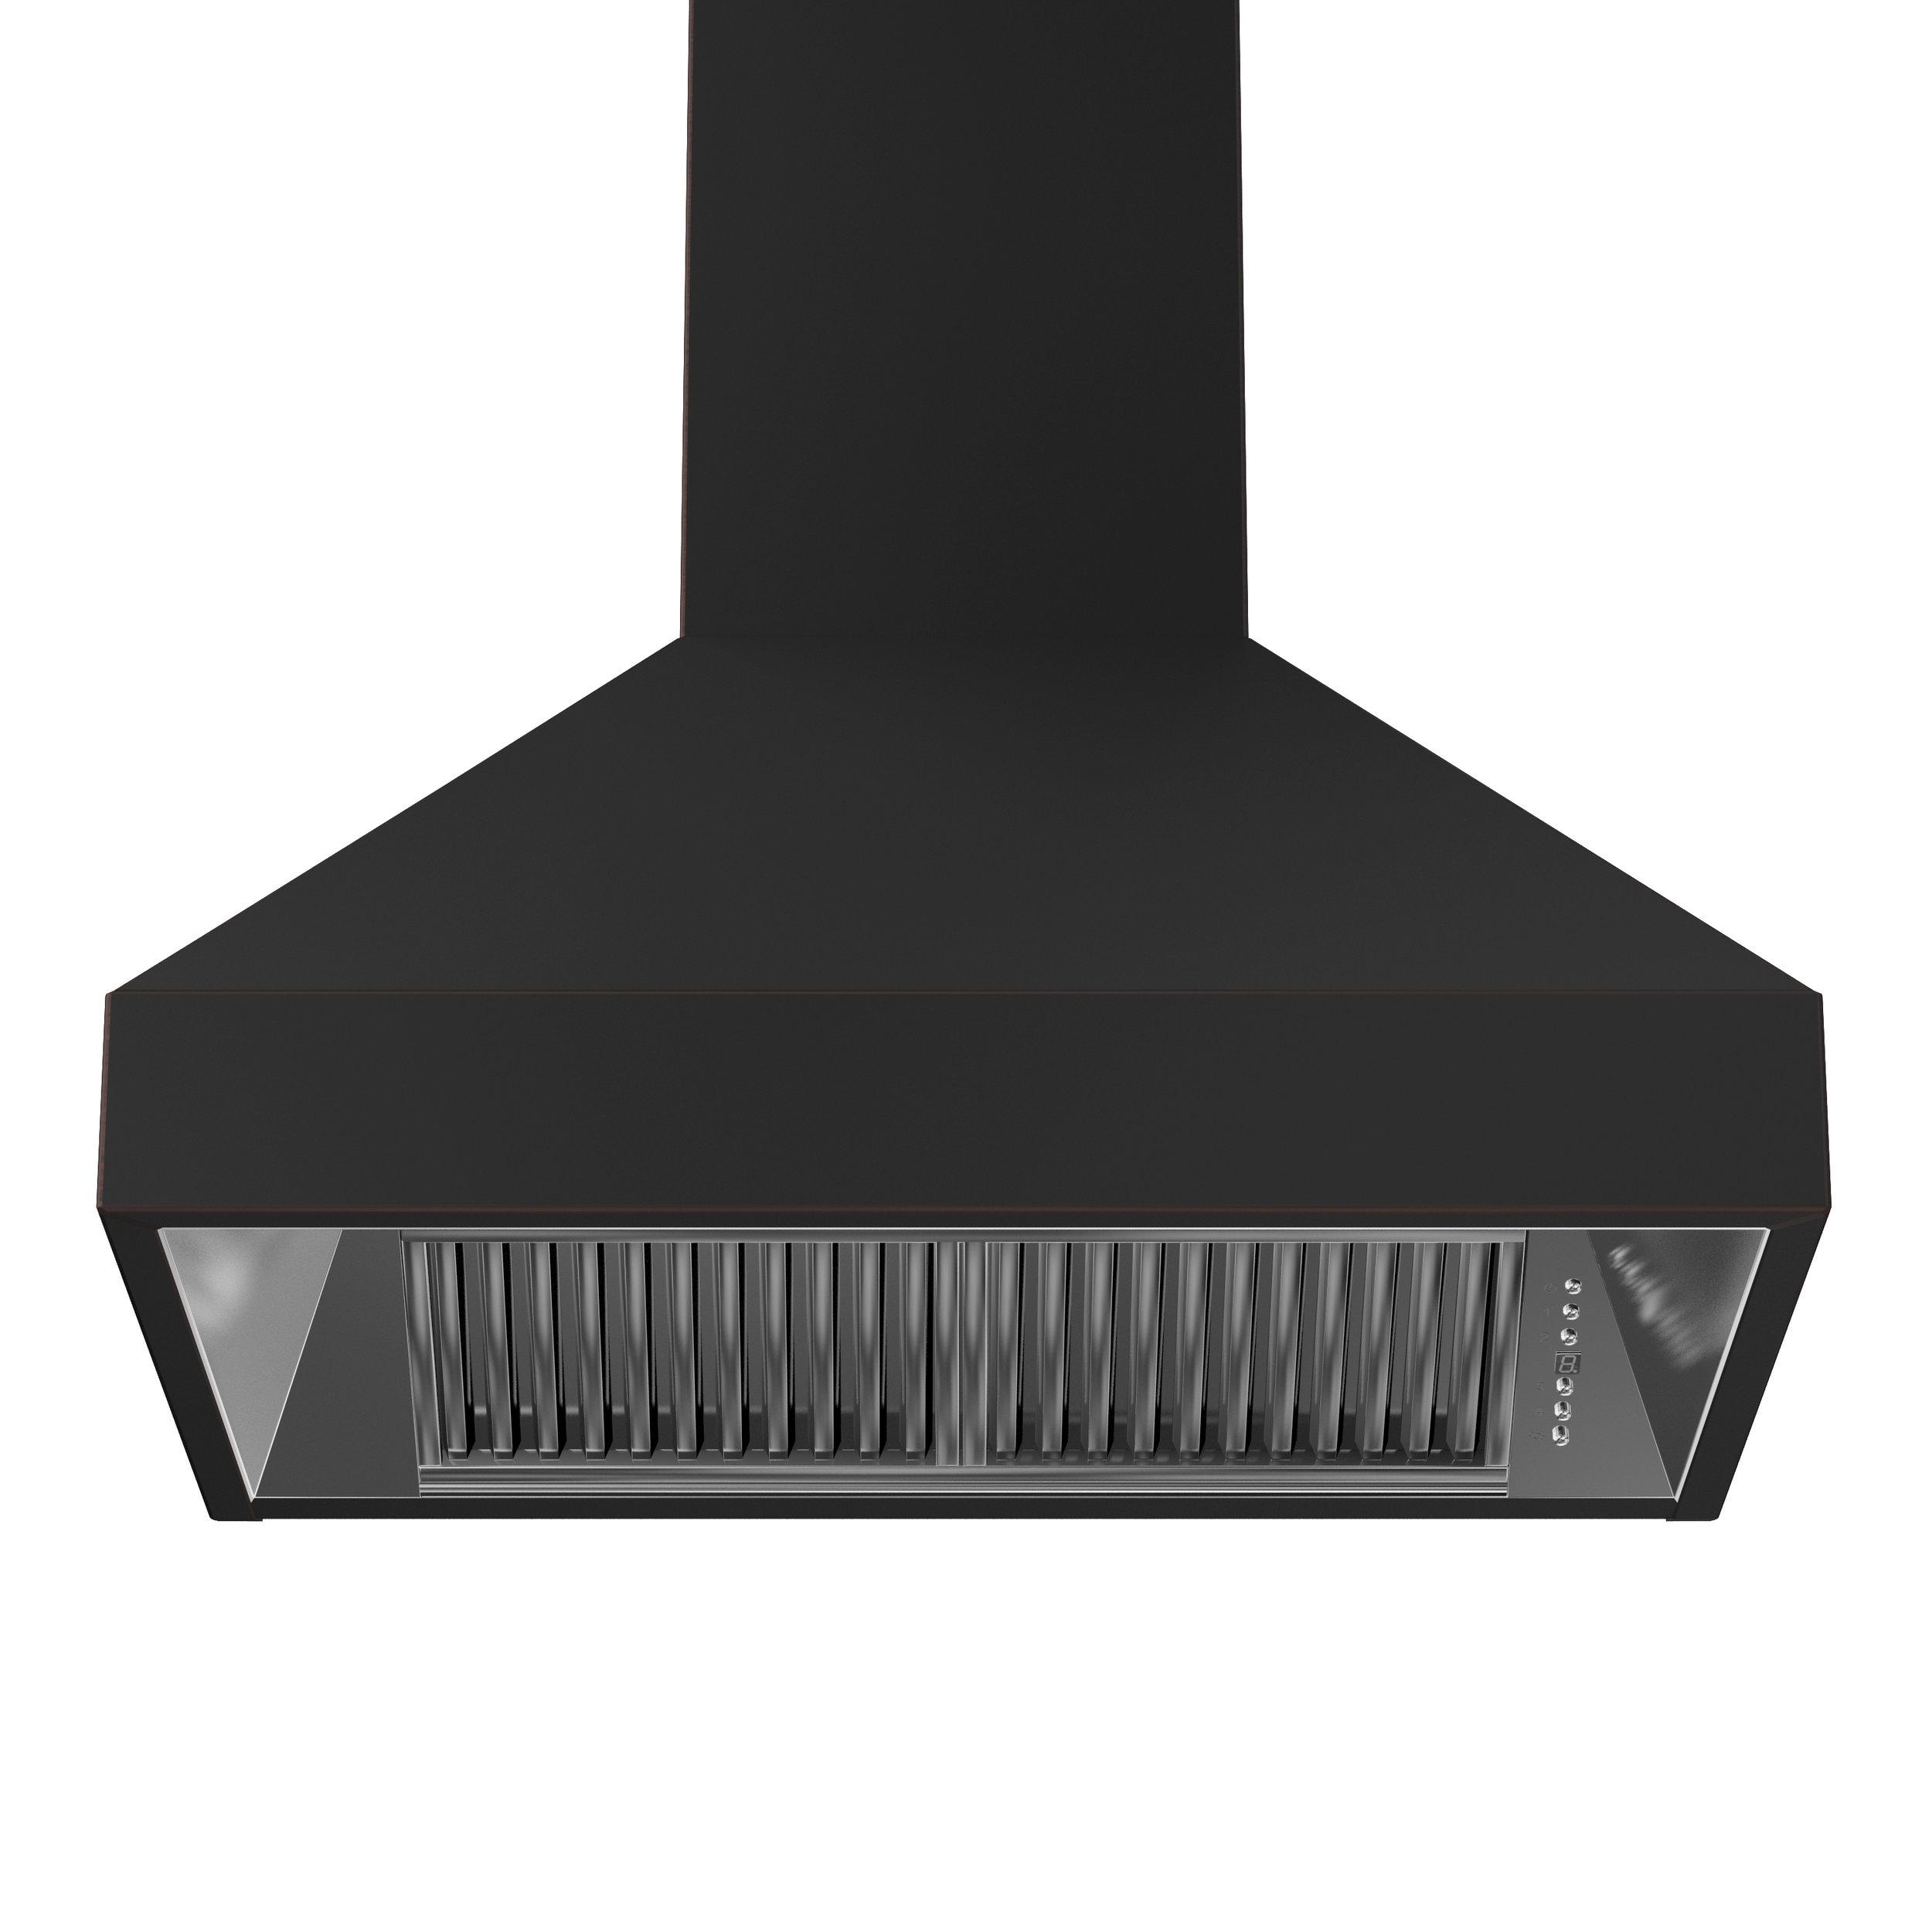 zline-copper-wall-mounted-range-hood-8667B-underneath.jpg